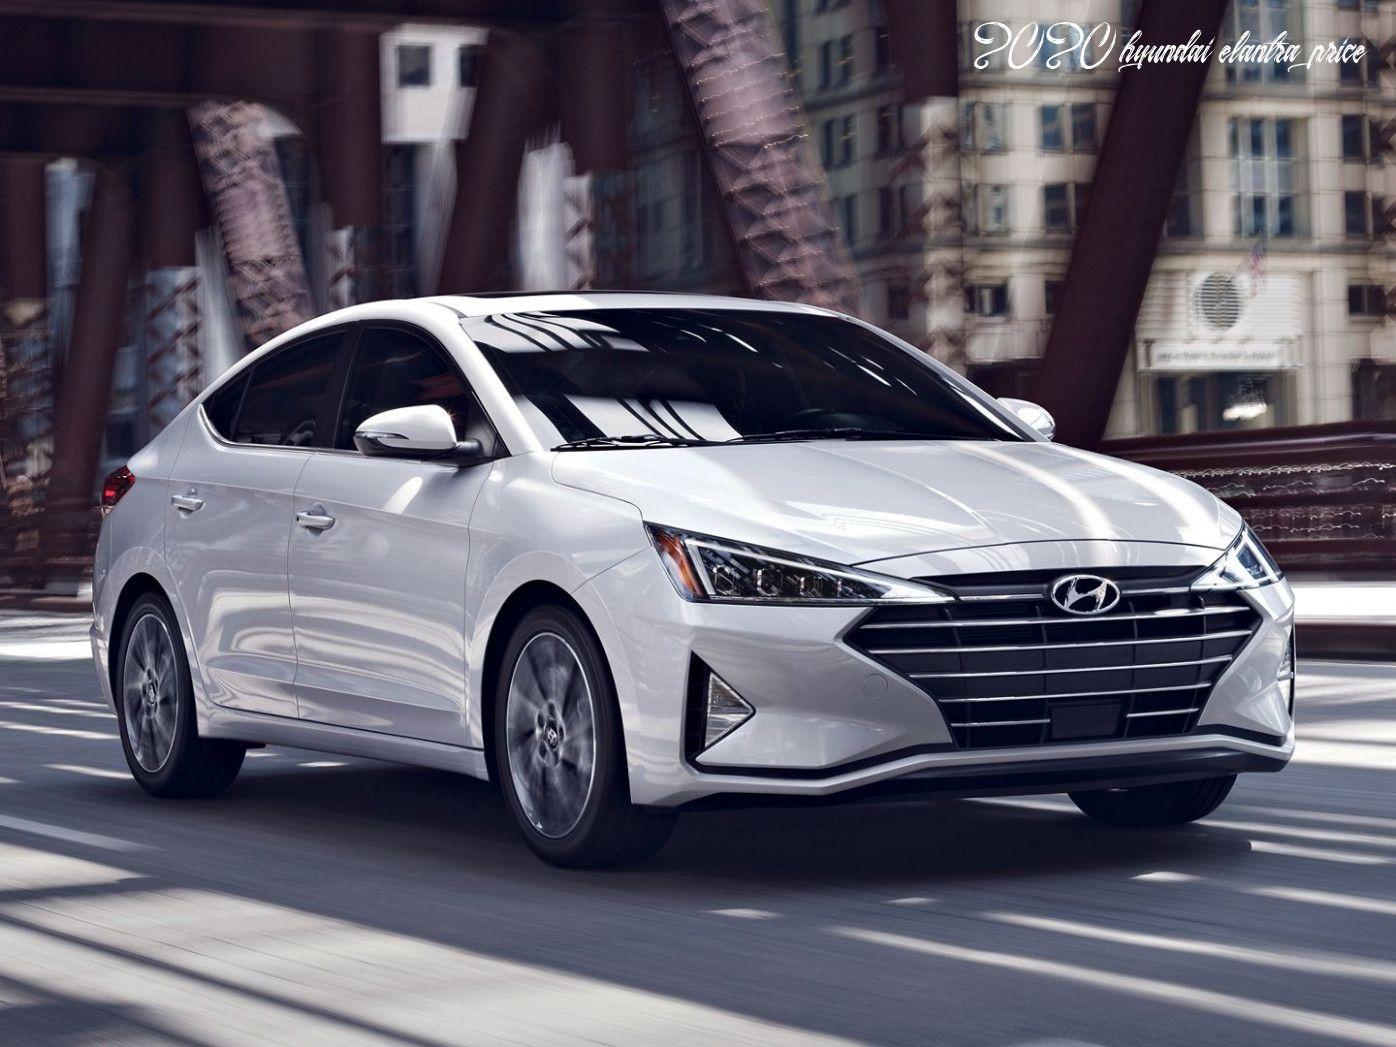 2020 Hyundai Elantra Price Model In 2020 Elantra Hyundai Elantra Hyundai